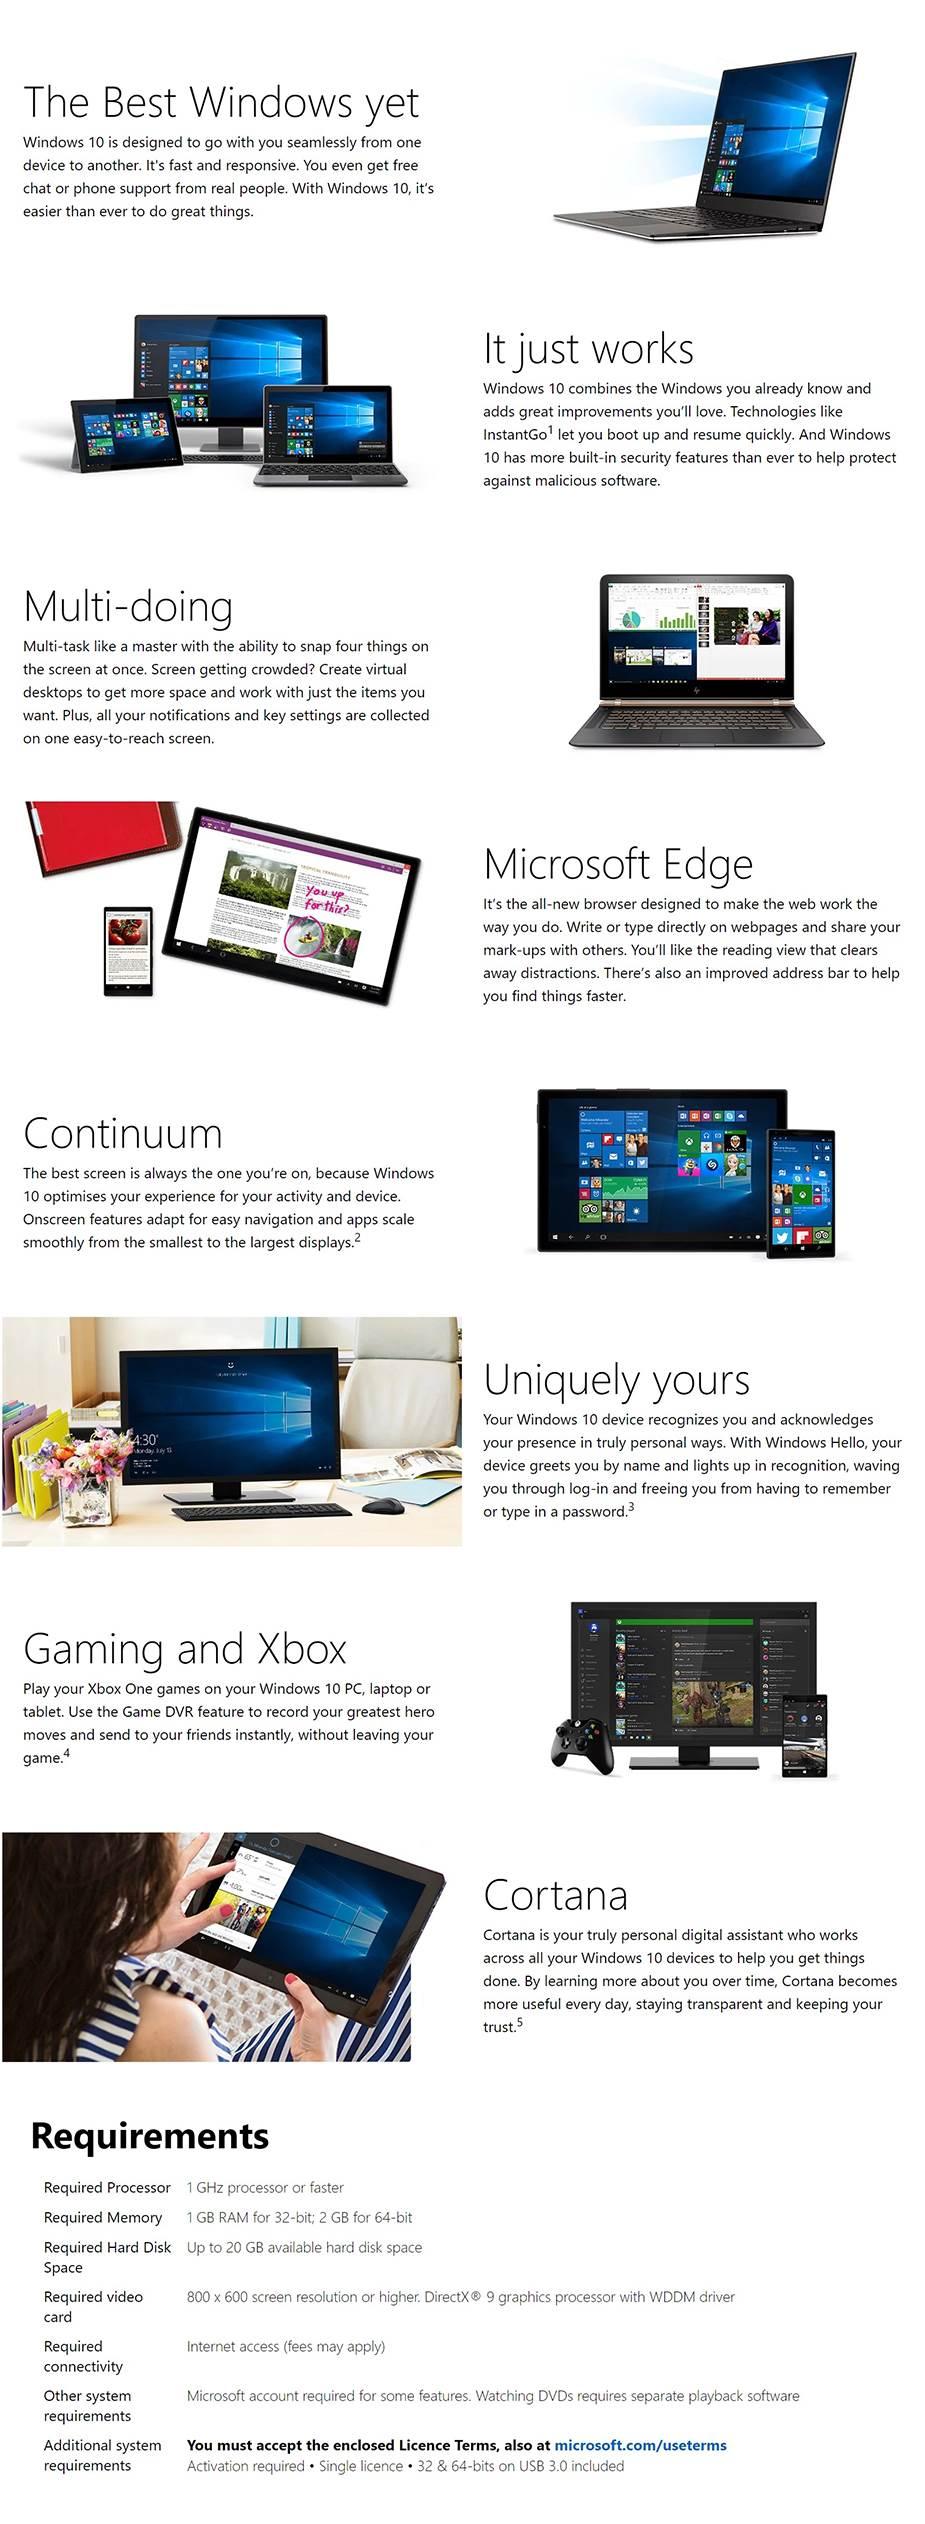 Microsoft Windows 10 Professional with Creators Update 32/64-bit USB Drive - Desktop Overview 1